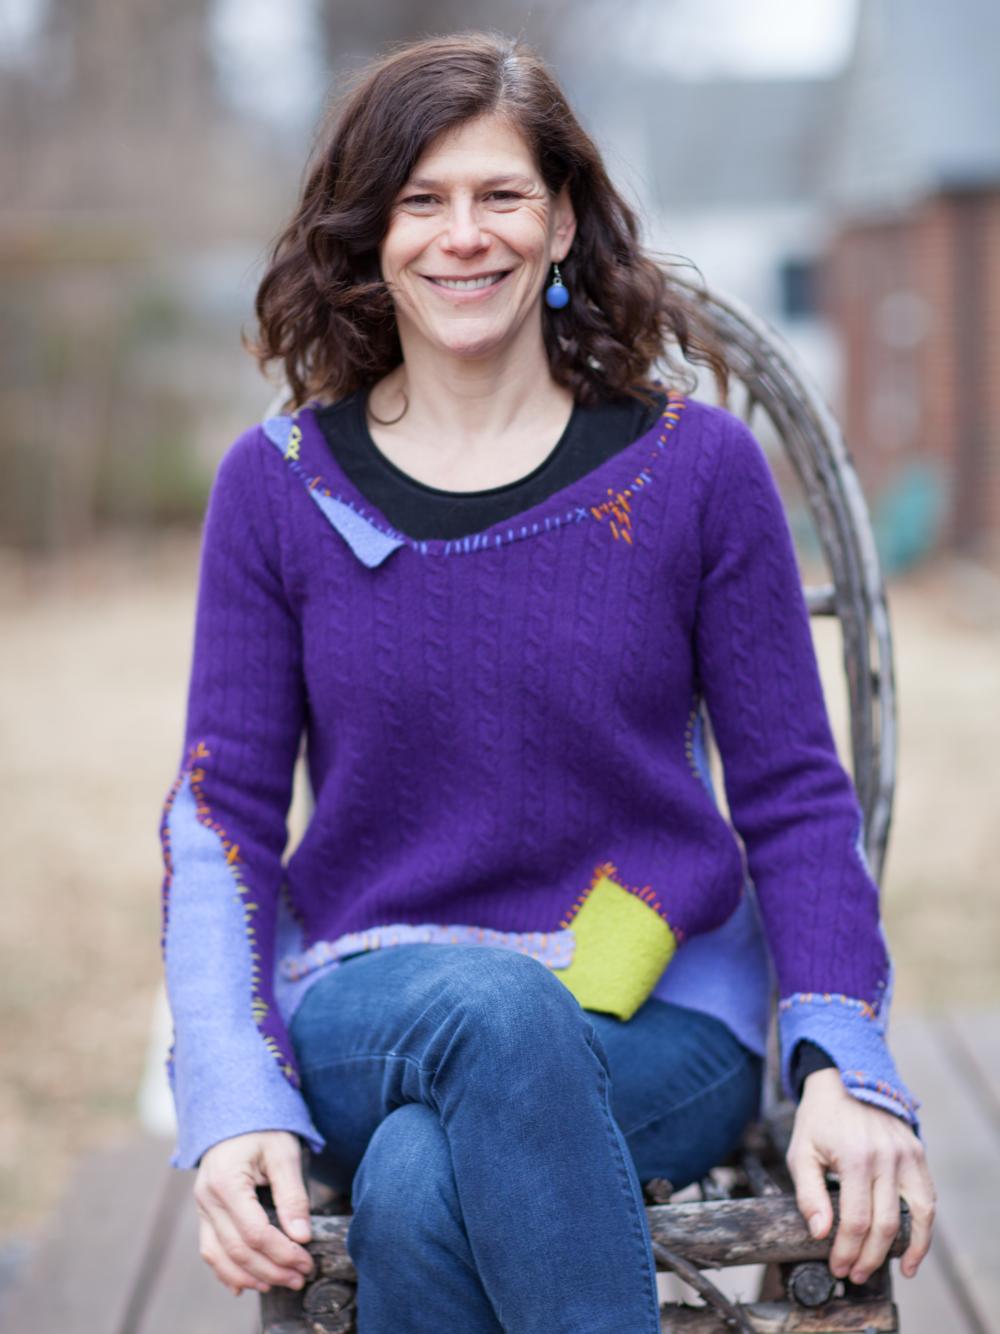 Marianne Baer, Artist & Owner of Baer Designs, Inc. Photo by Michael Kilfoy Studio X